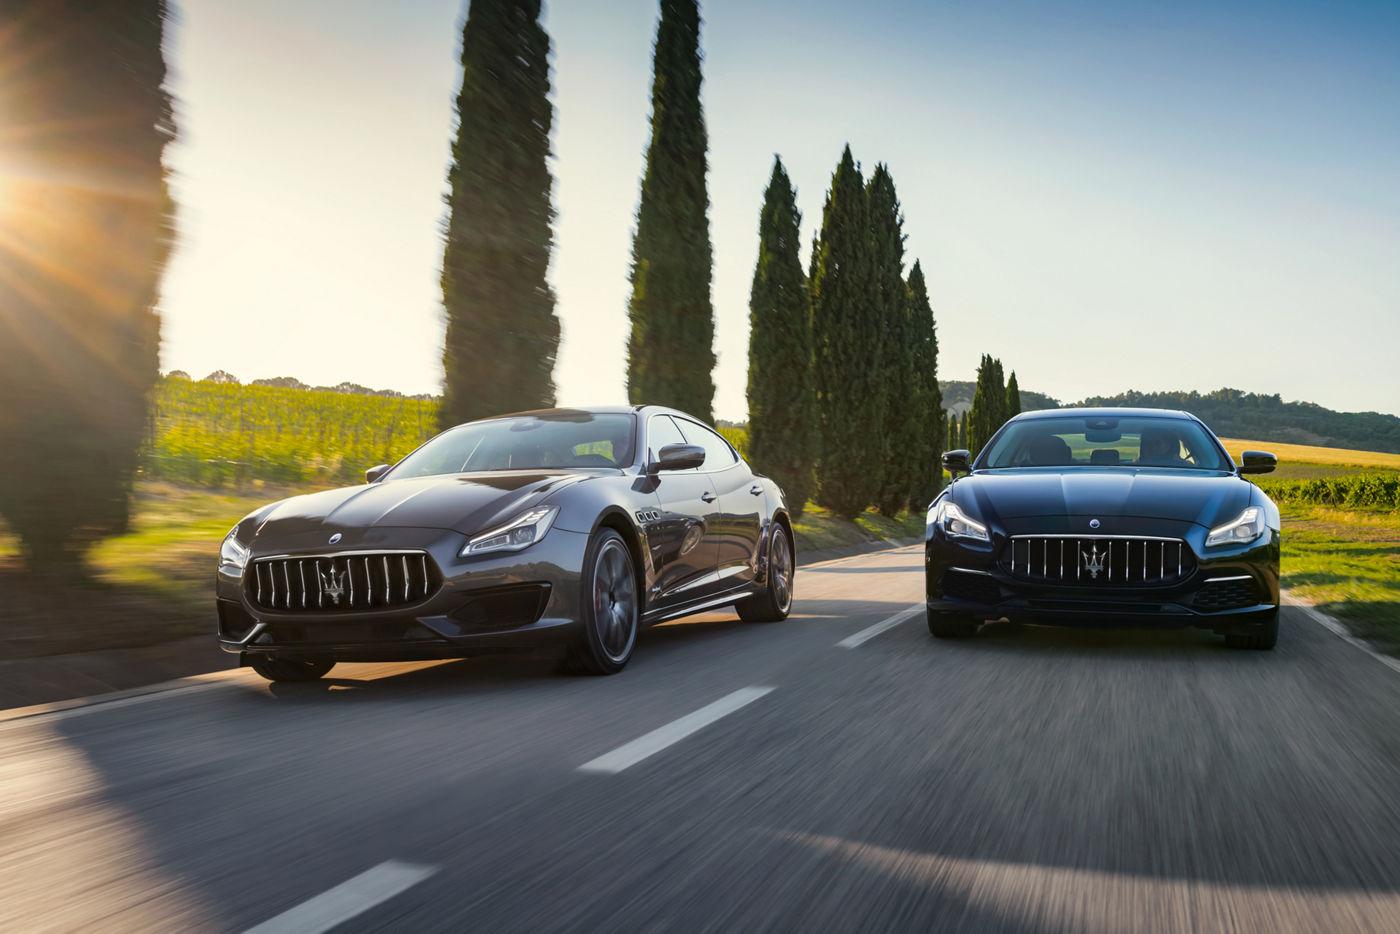 Maserati Quattroporte Range